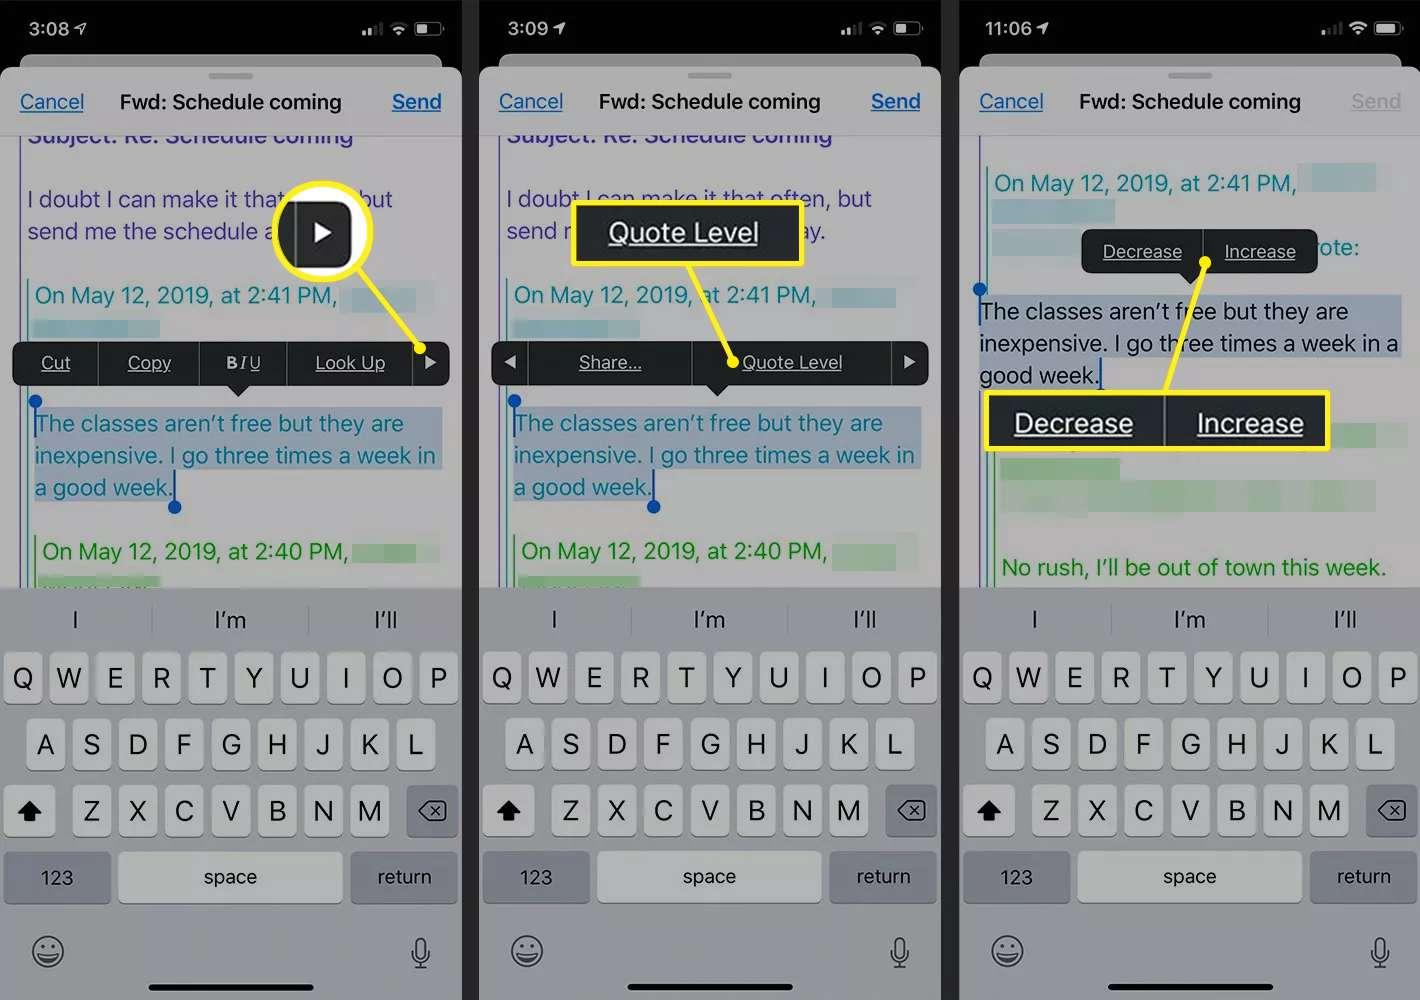 Floating menu bar in iOS Mail app